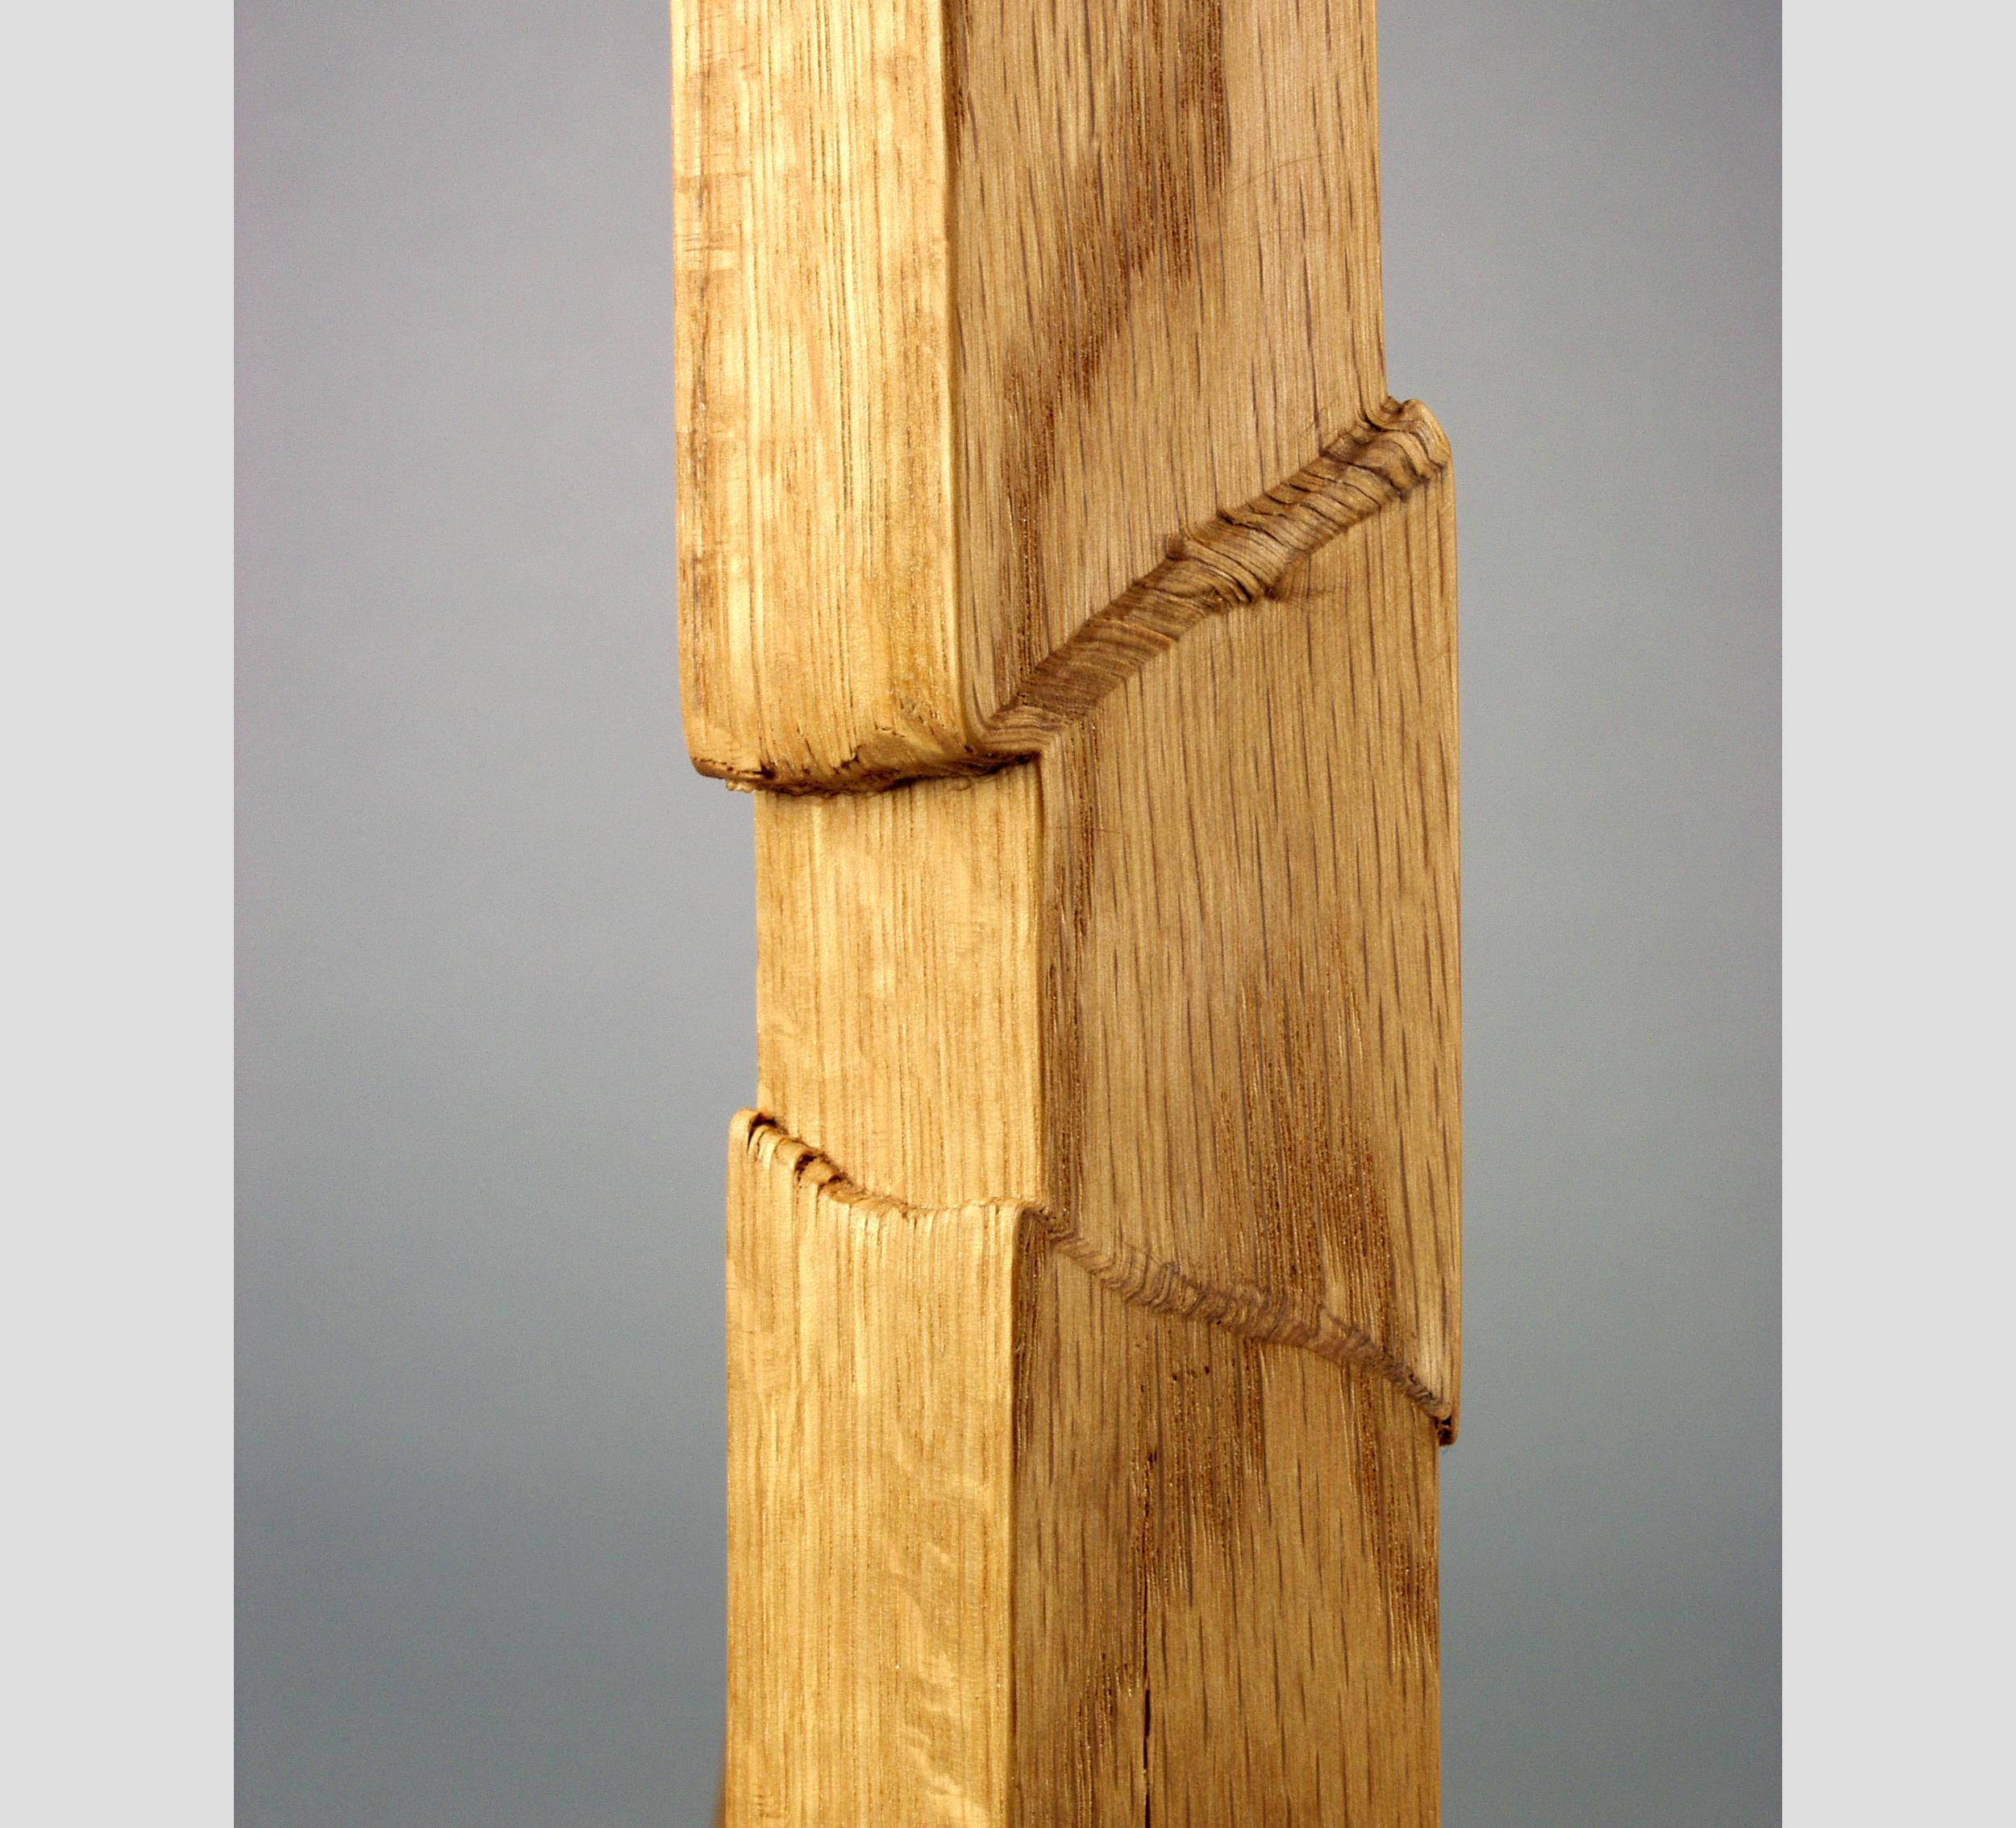 Heavy I 2004 I pressure fractured oak, paint I 25 x 12 x 14